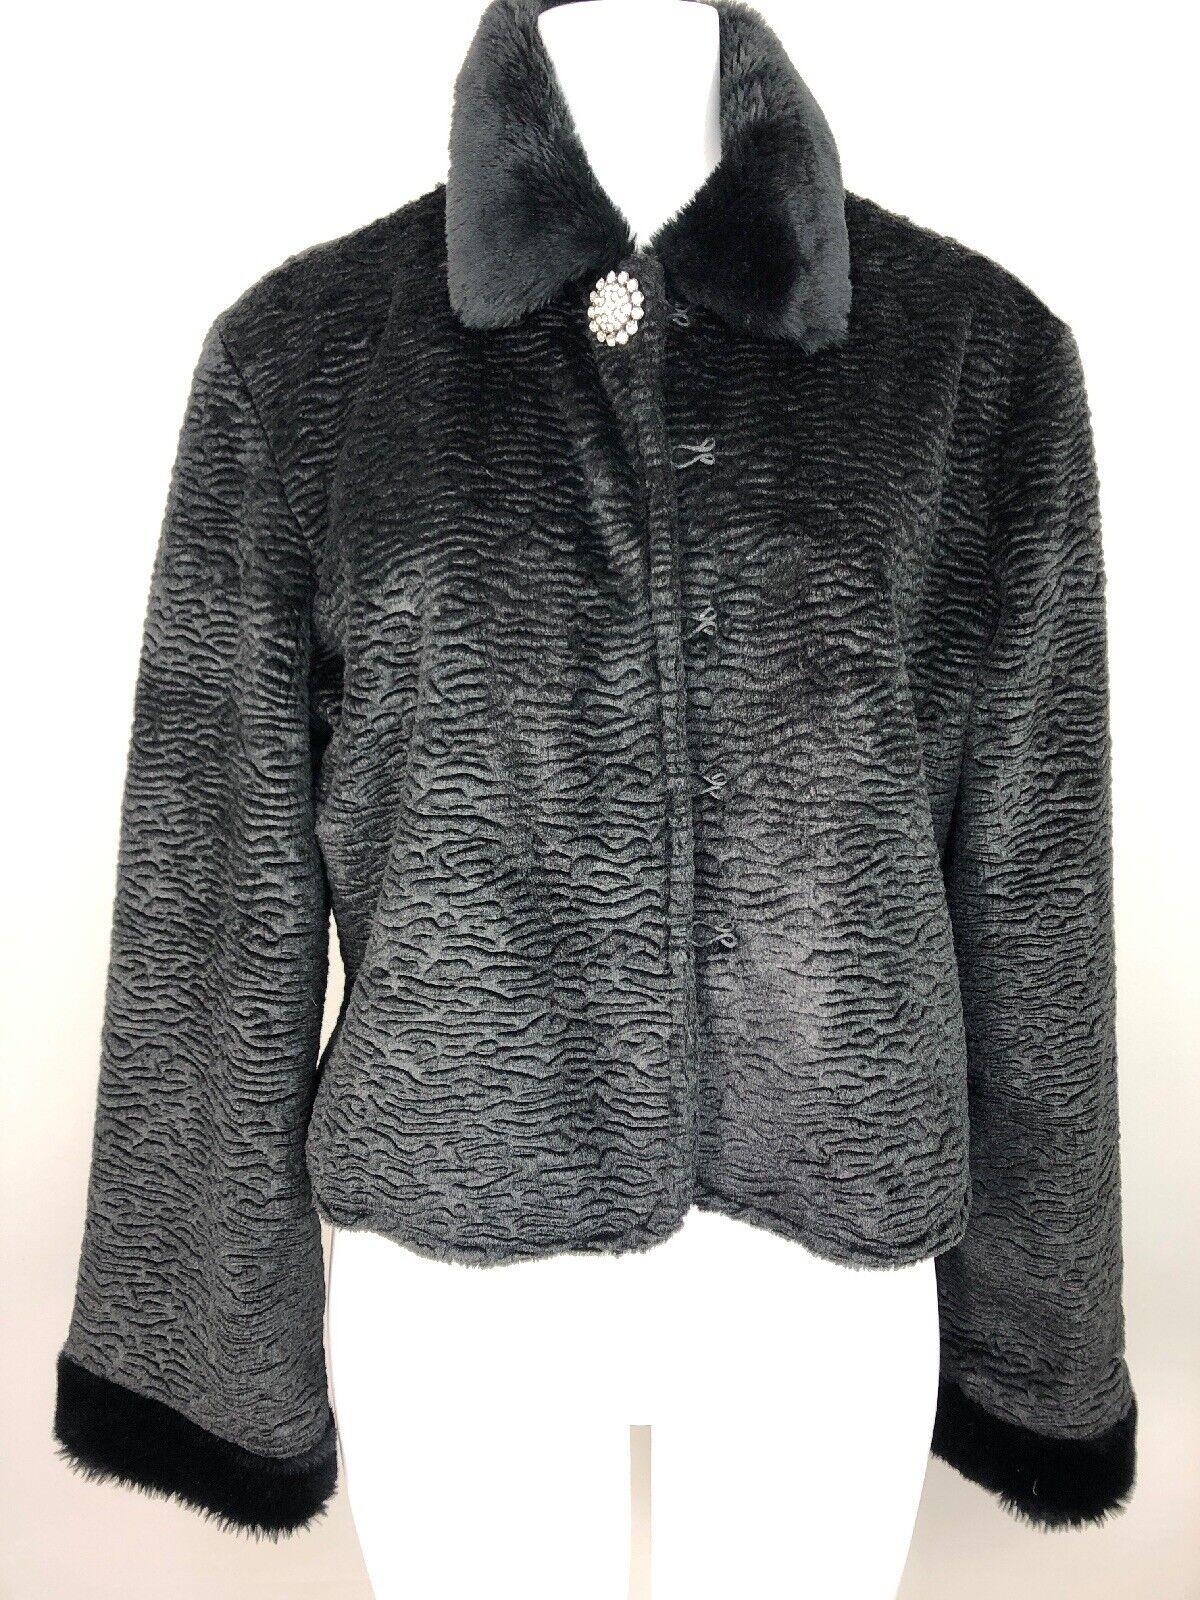 Brandon Thomas Womens Large Black Faux Fur Lamb One Jeweled Button Jacket